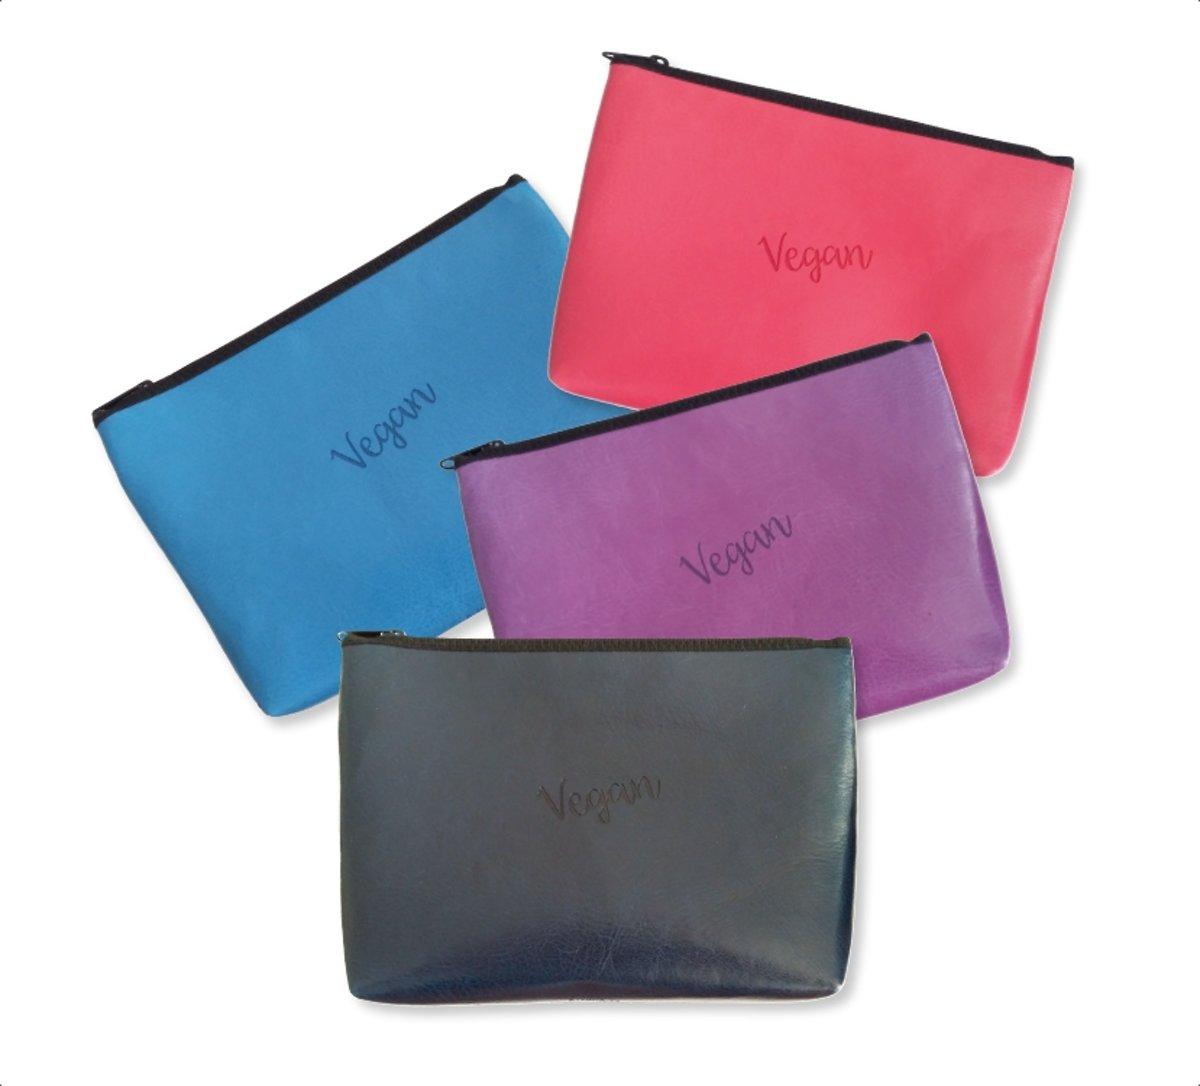 Make up tasje - Roze | Beauty Case - Pink | Vegan Collection kopen